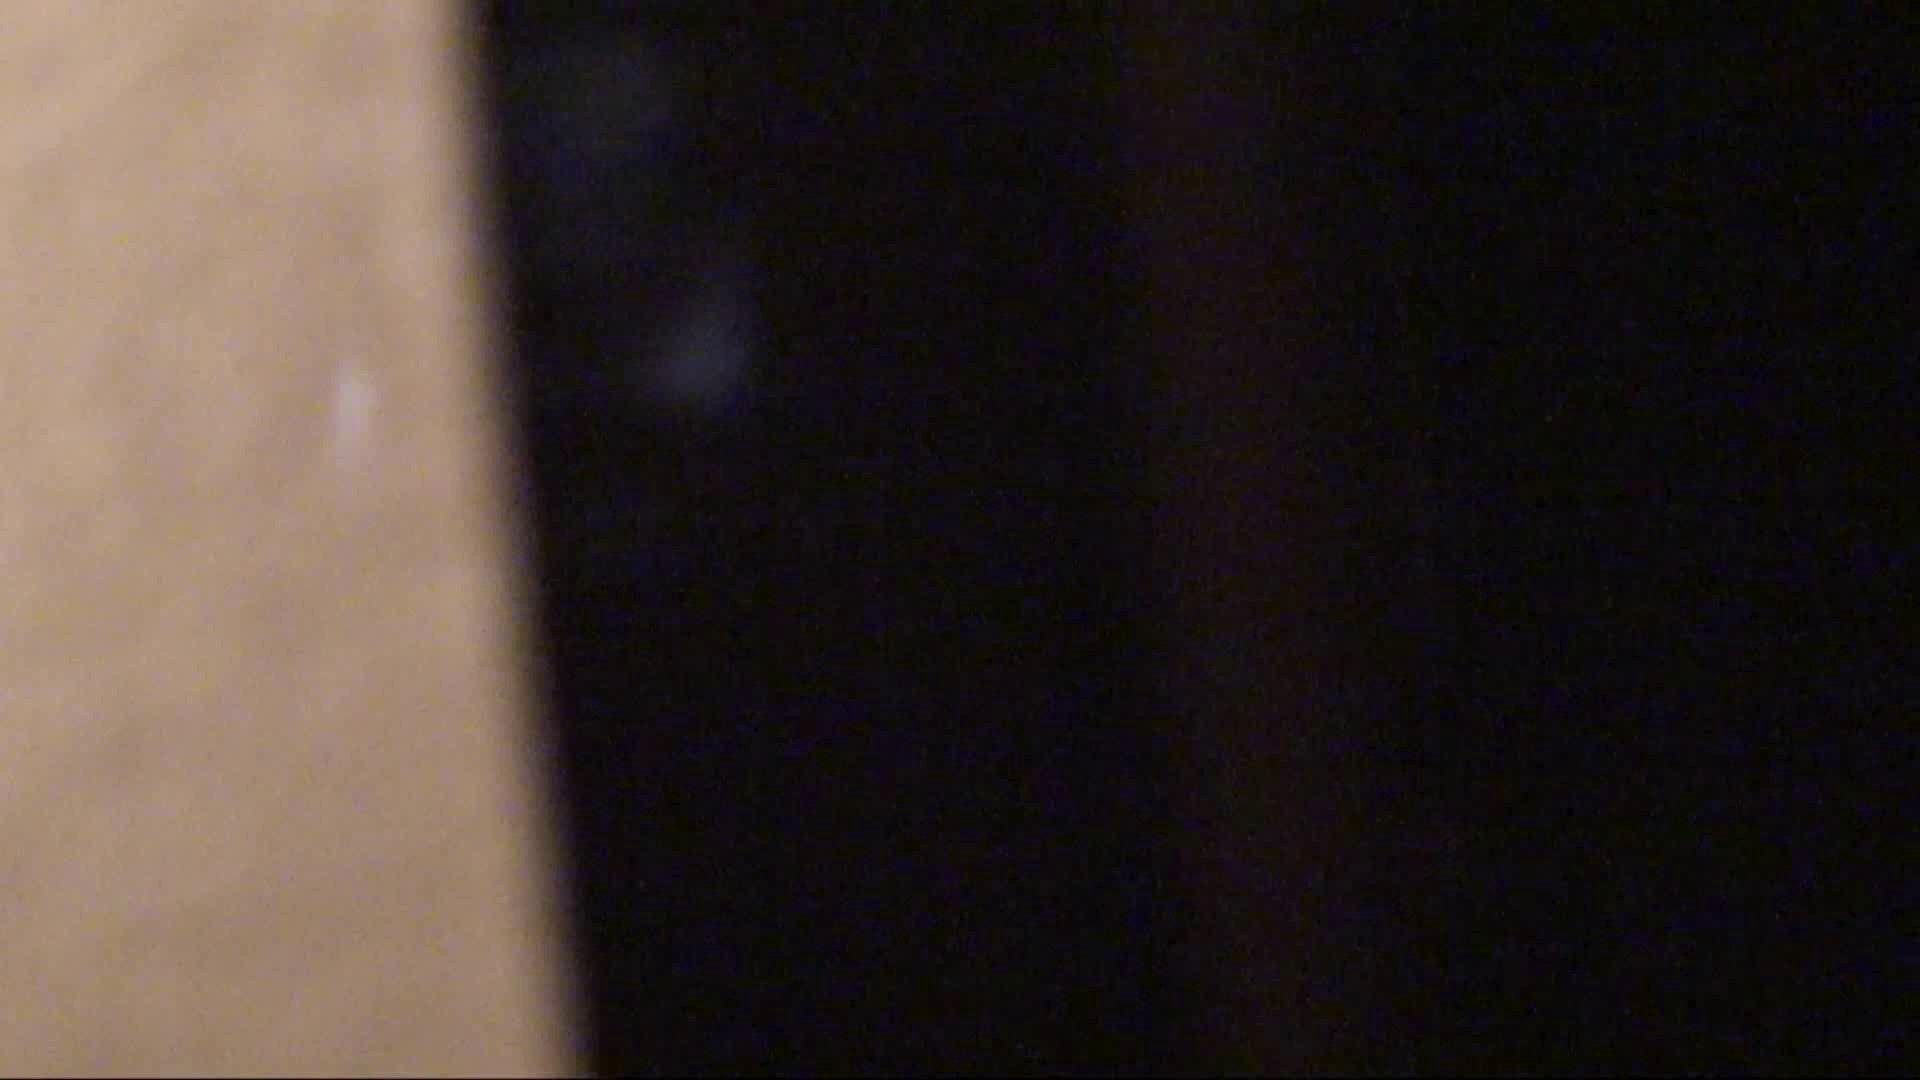 vol.01必見!白肌嬢の乳首が丸見え。極上美人のすっぴん顔をハイビジョンで! ギャルの乳首 AV無料動画キャプチャ 71画像 61